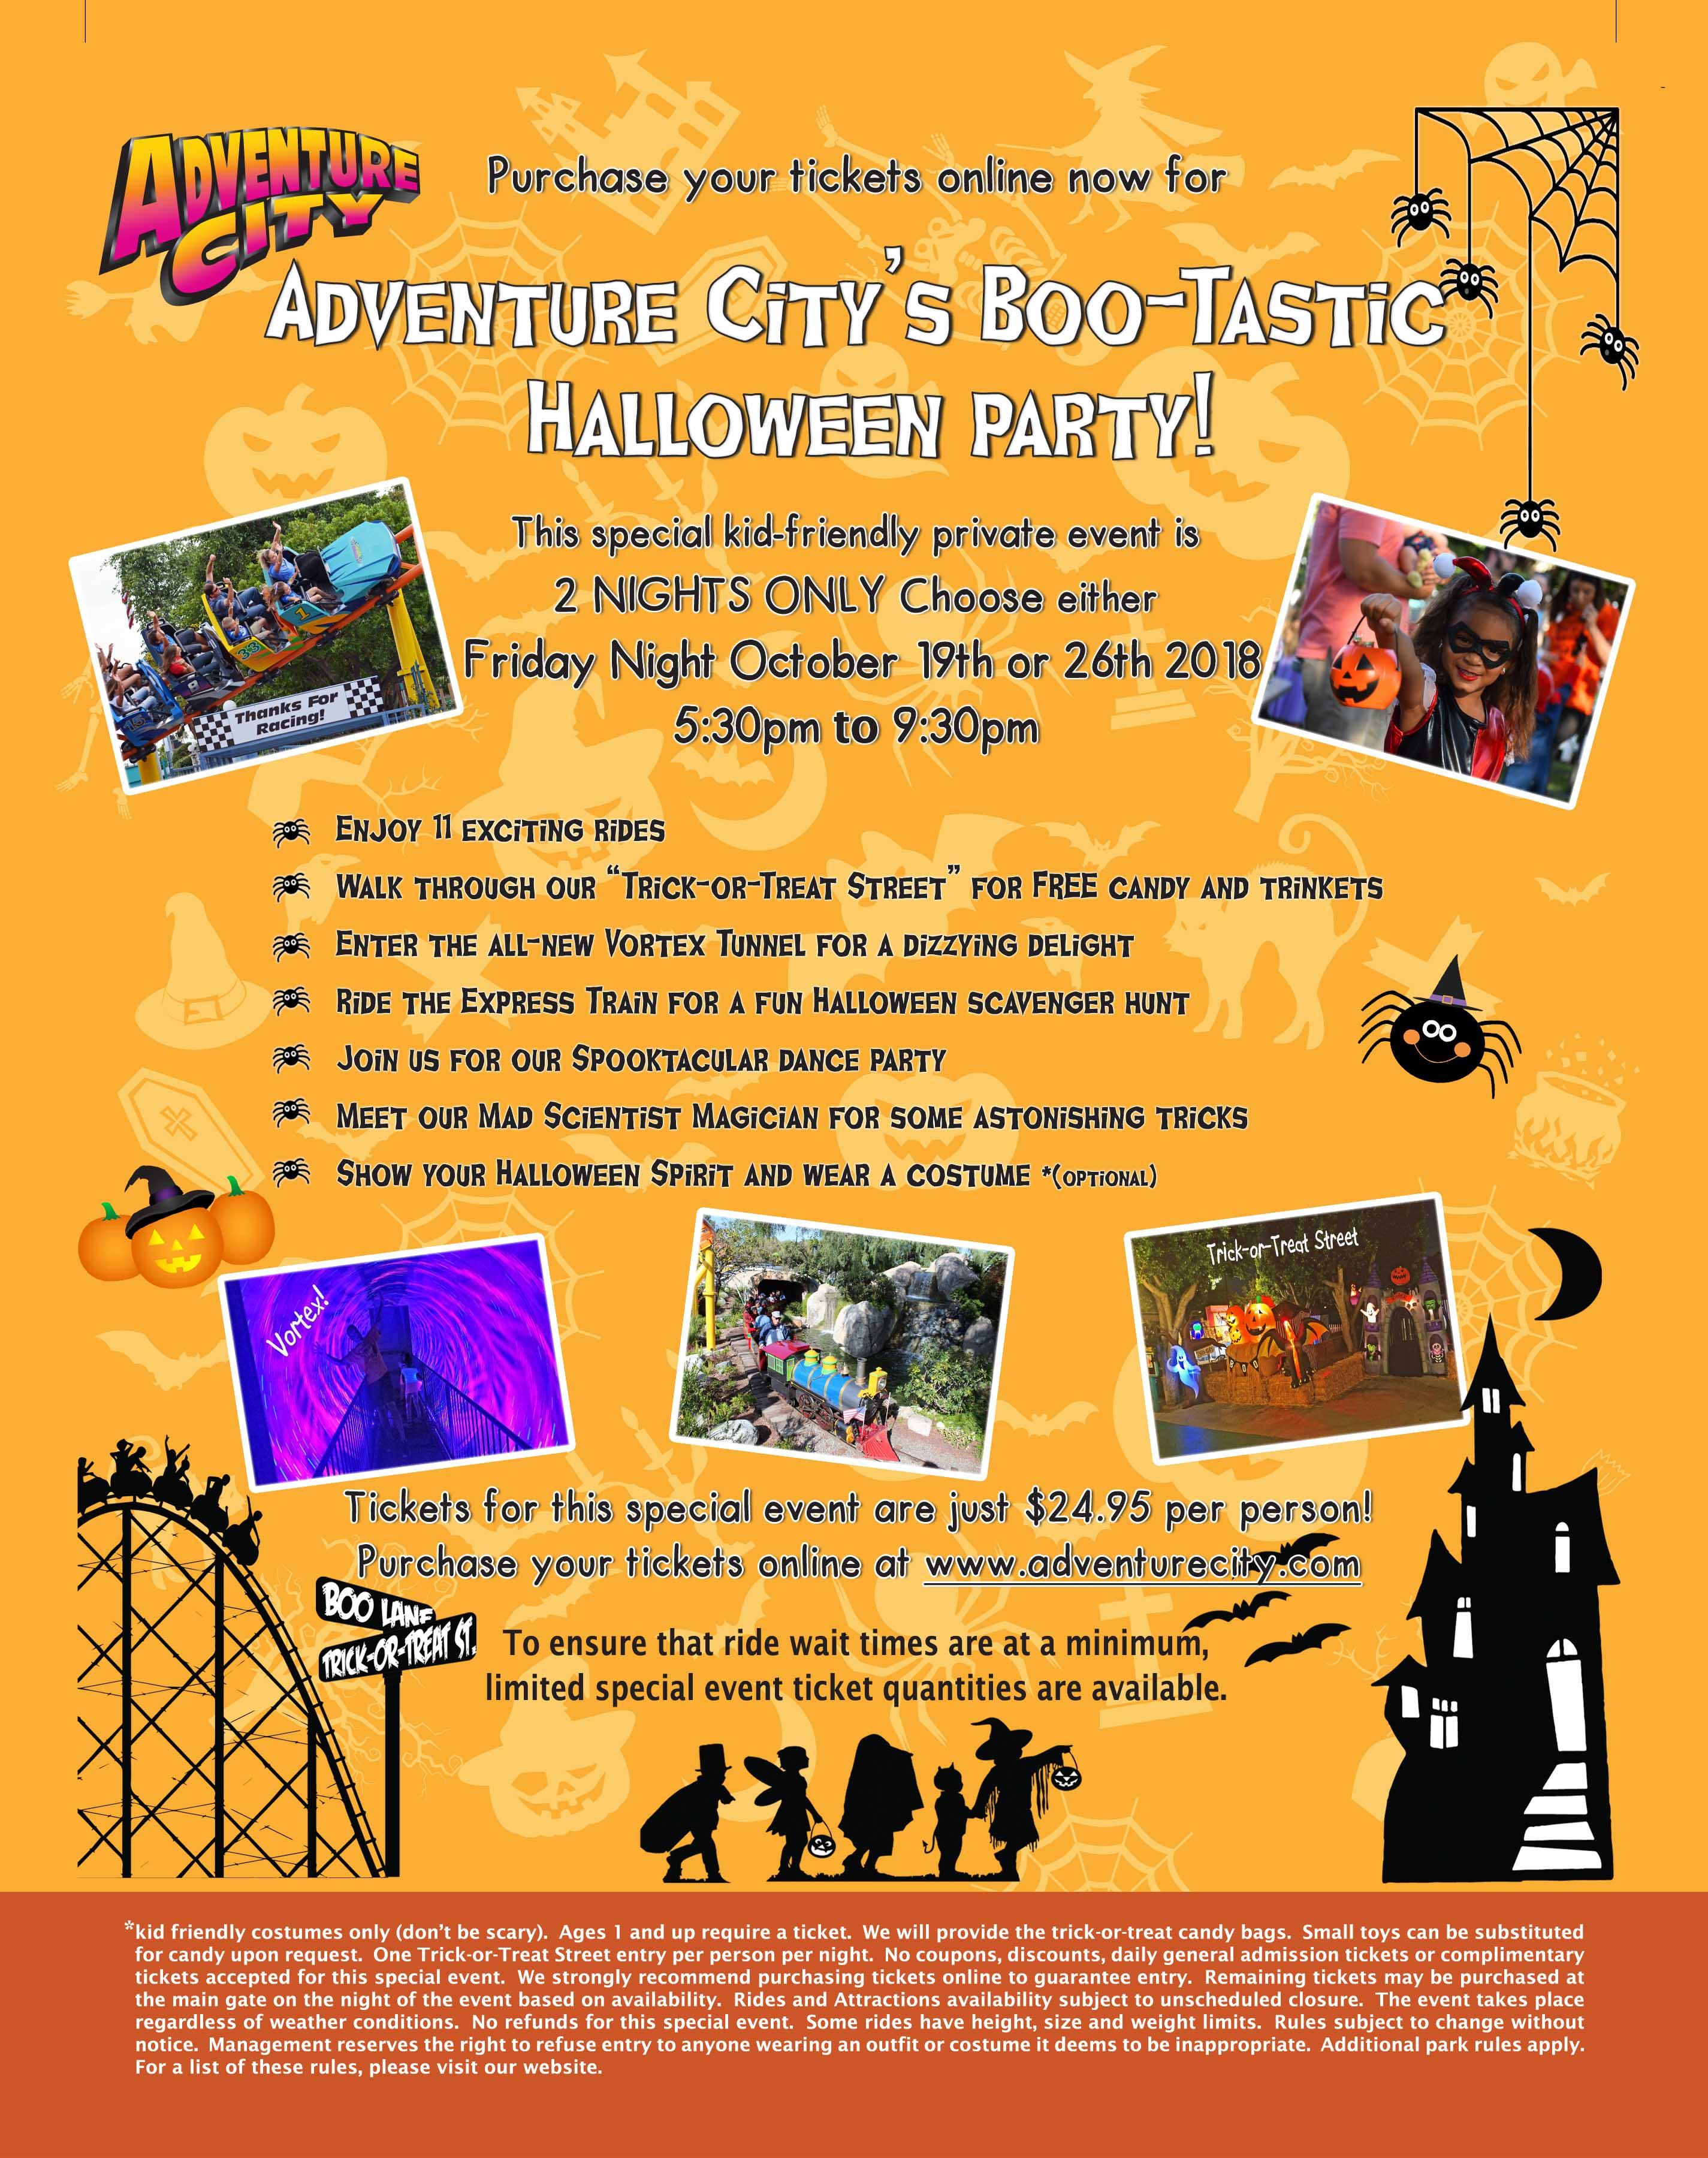 Boo-Tastic Halloween 2020, October 26 Adventure City's Boo Tastic Halloween Party + Win Tickets   Family